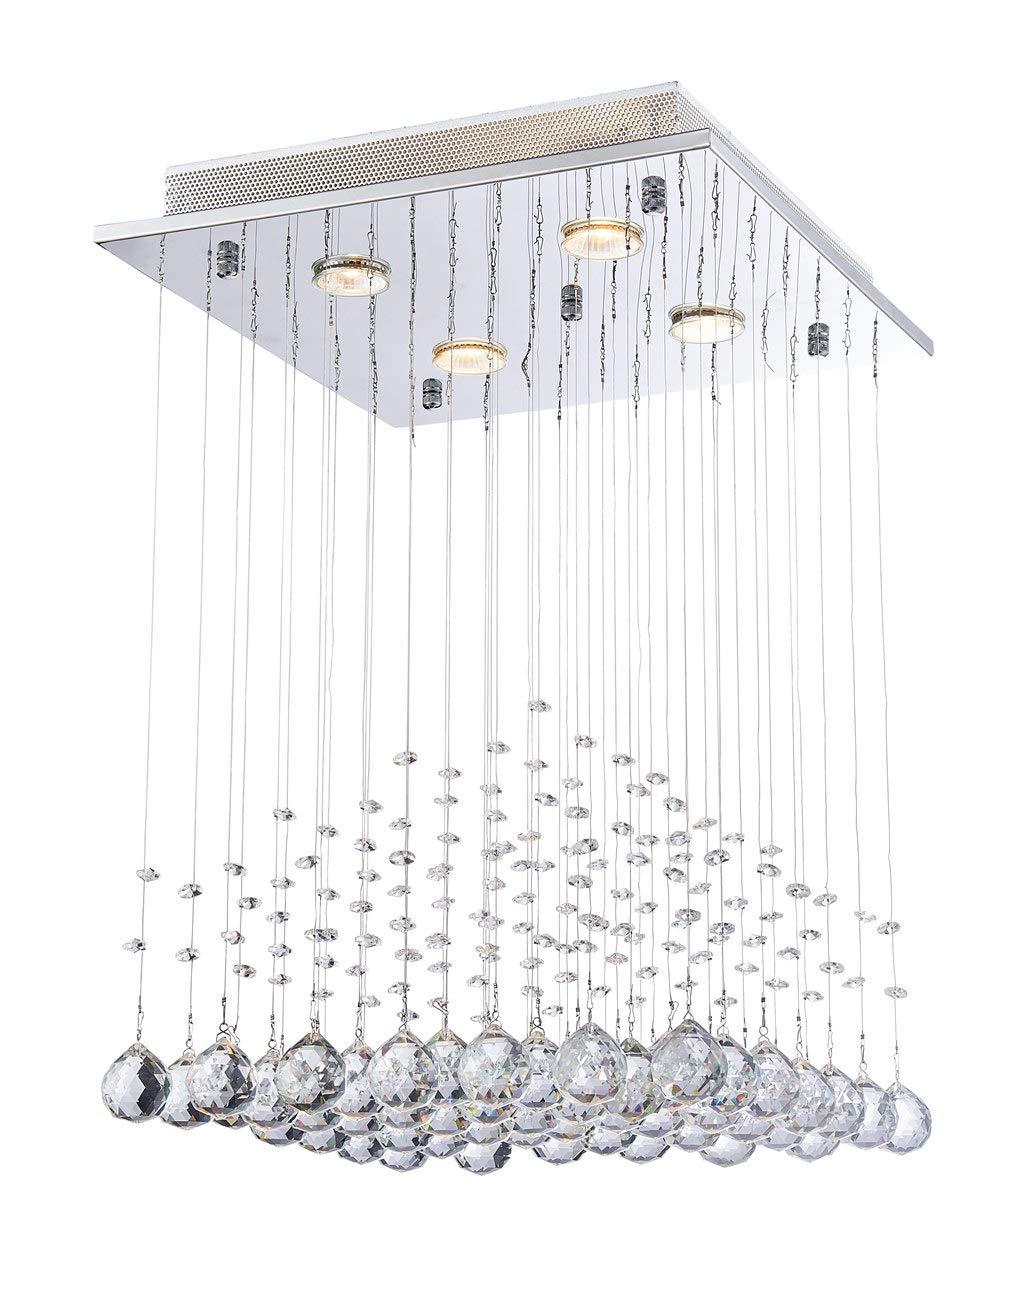 Saint Mossi Modern K9 Crystal Lámpara de araña de lluvia Iluminación Montaje empotrado Lámpara de techo de LED Lámpara colgante para comedor Baño Sala de ...